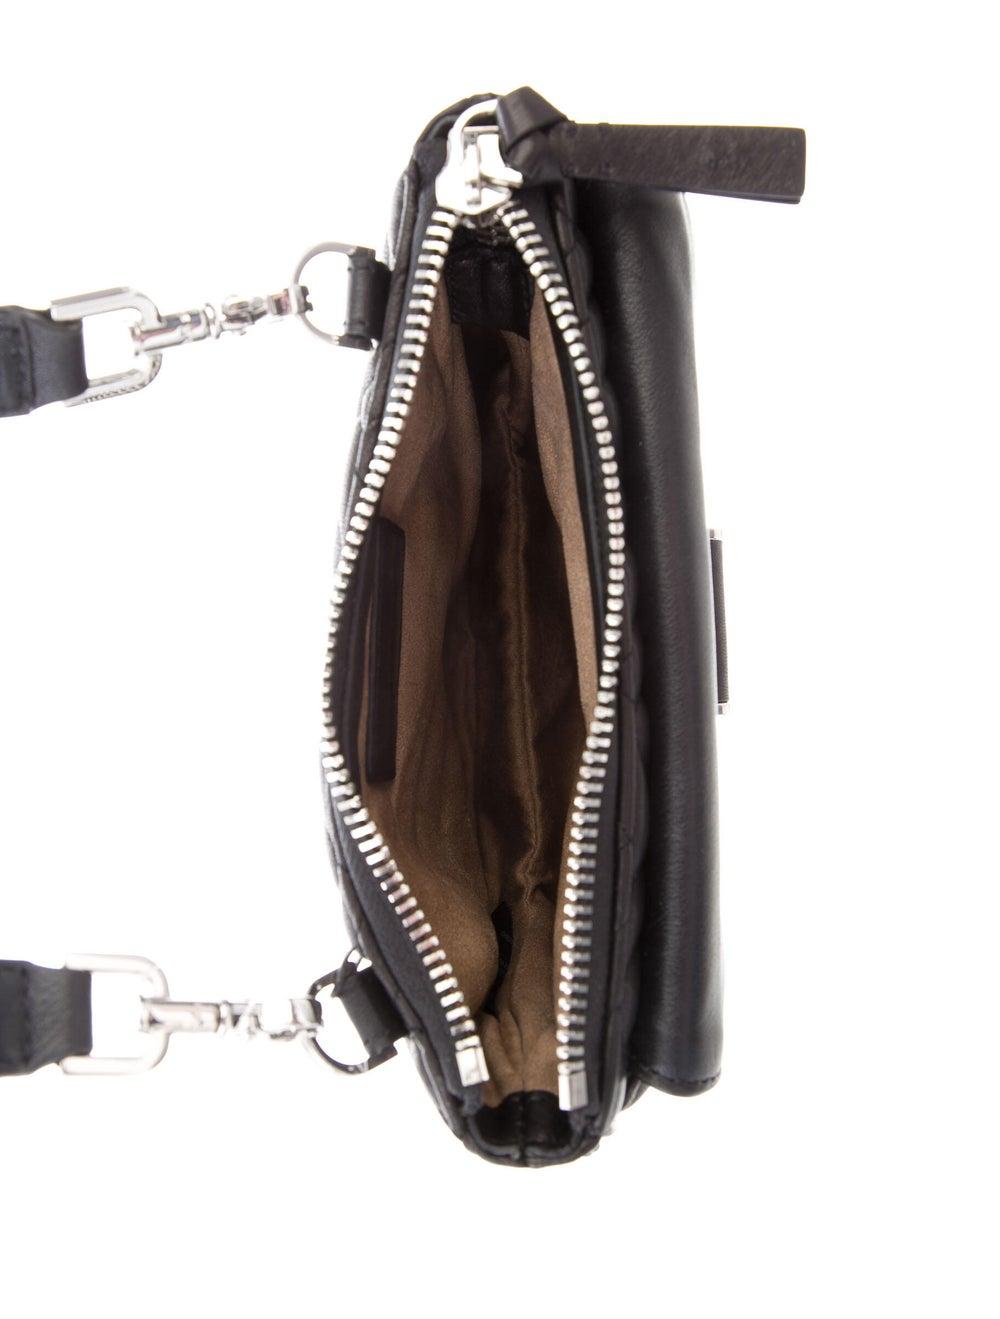 Mackage Leather Crossbody Bag Black - image 5